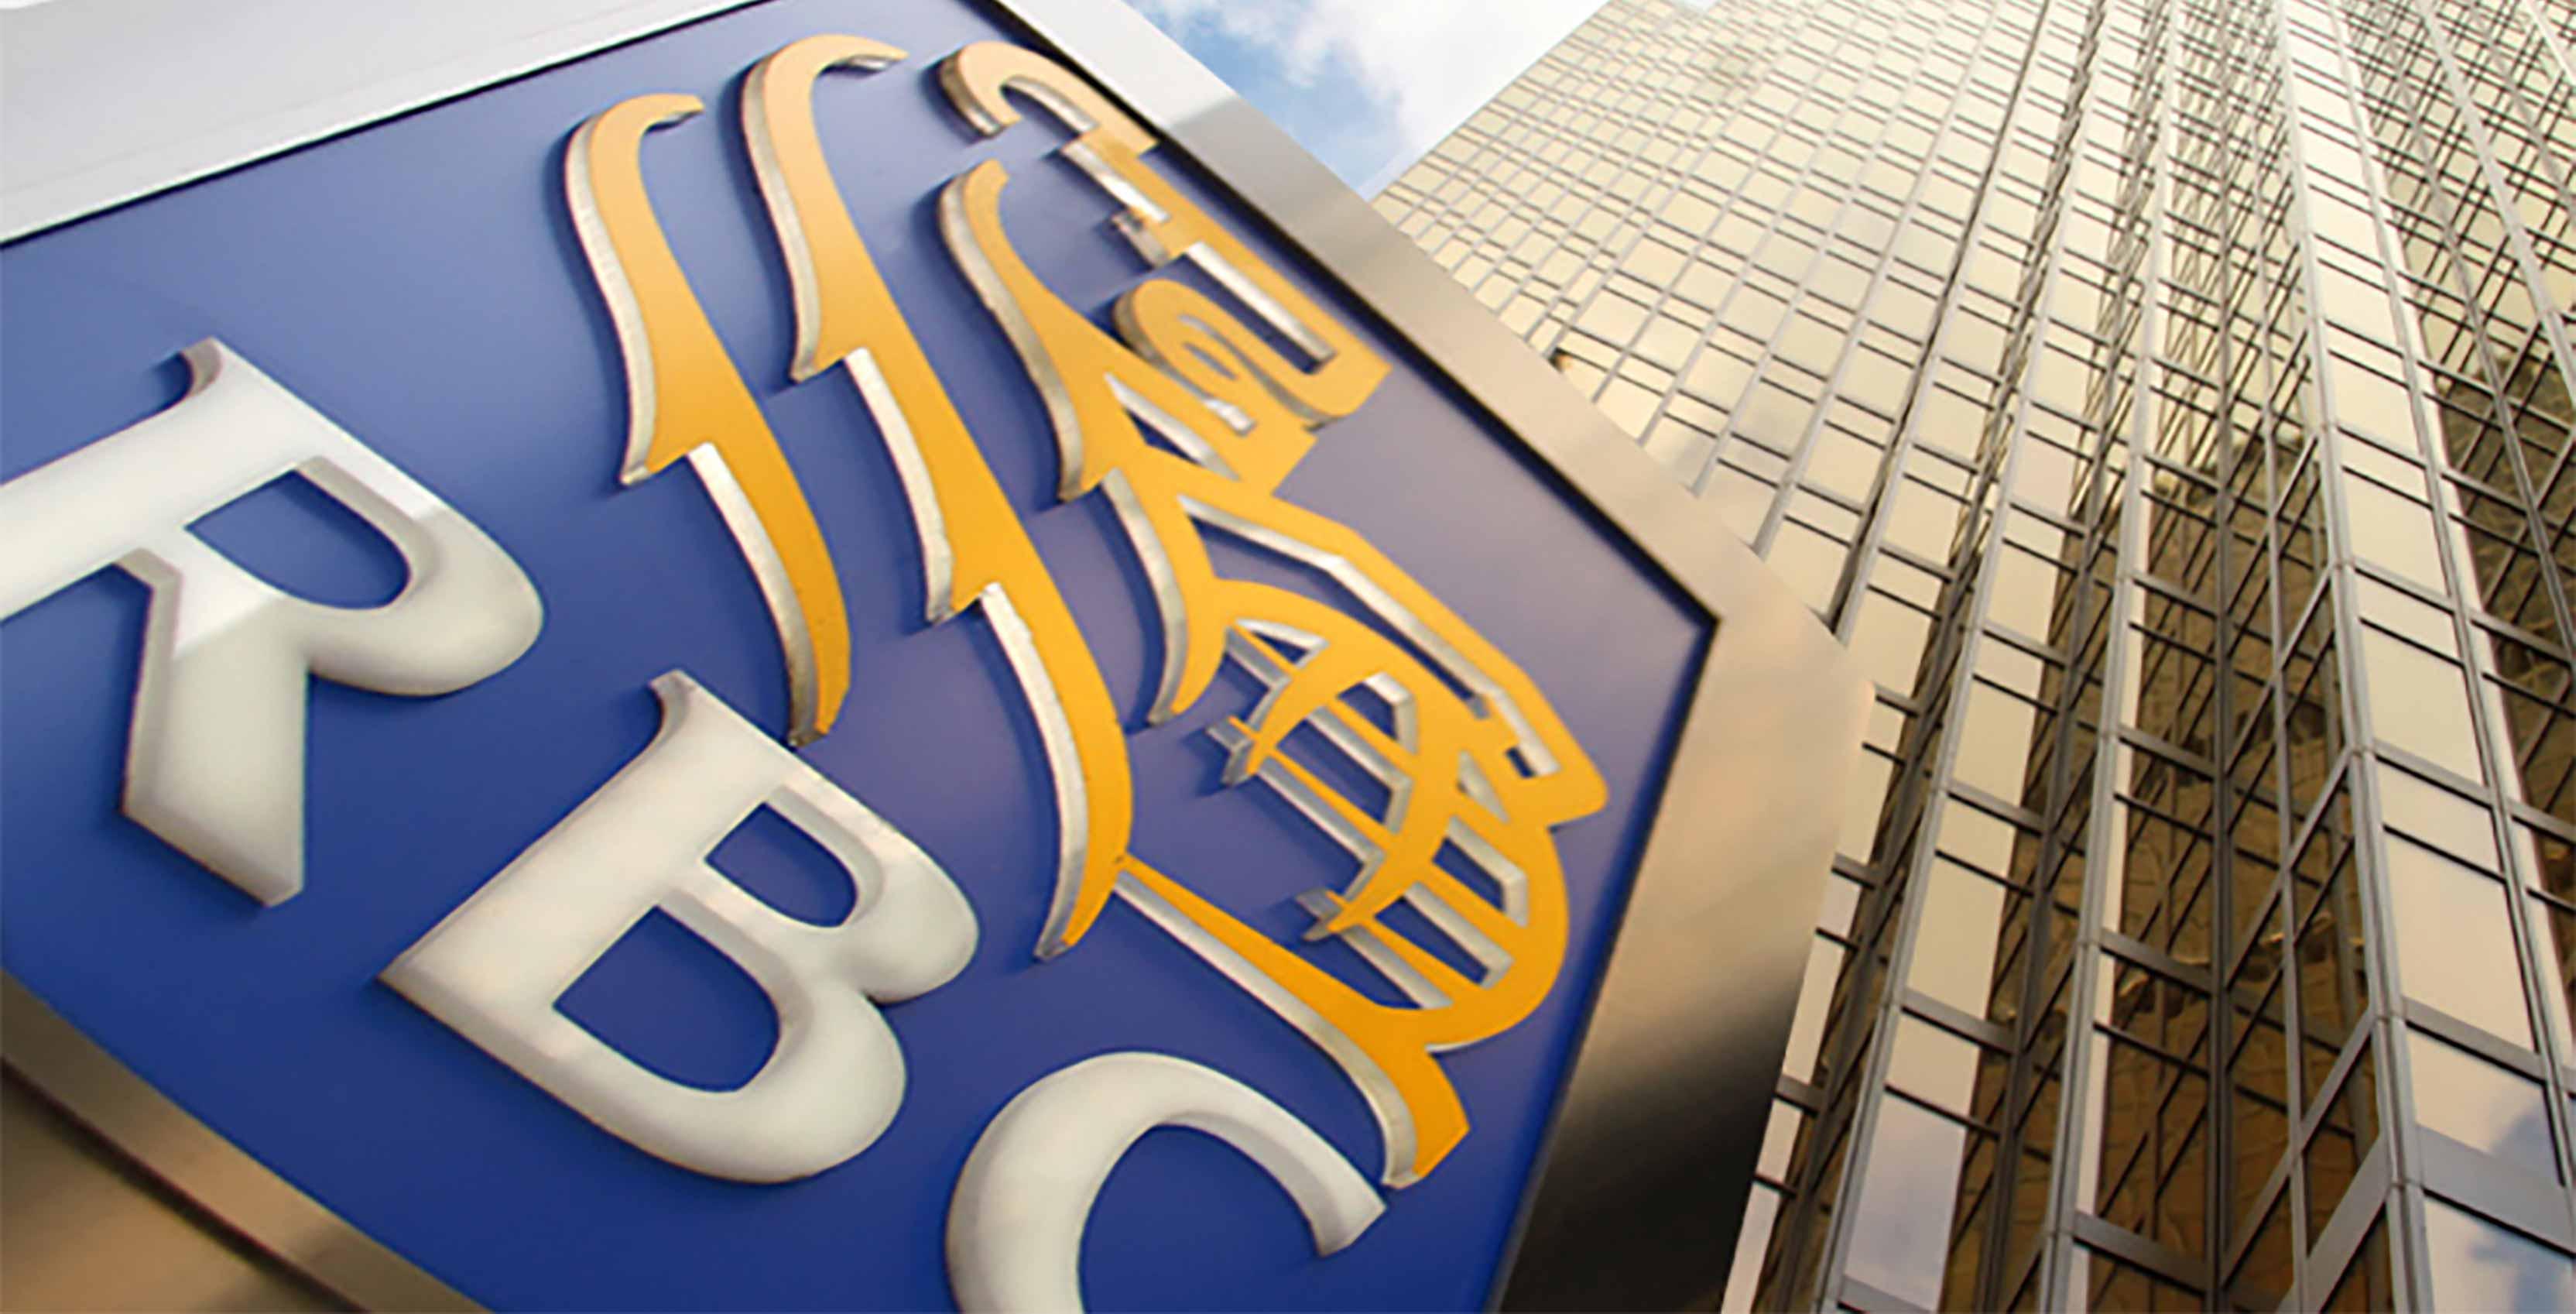 RBC Building - rbc myadvisor